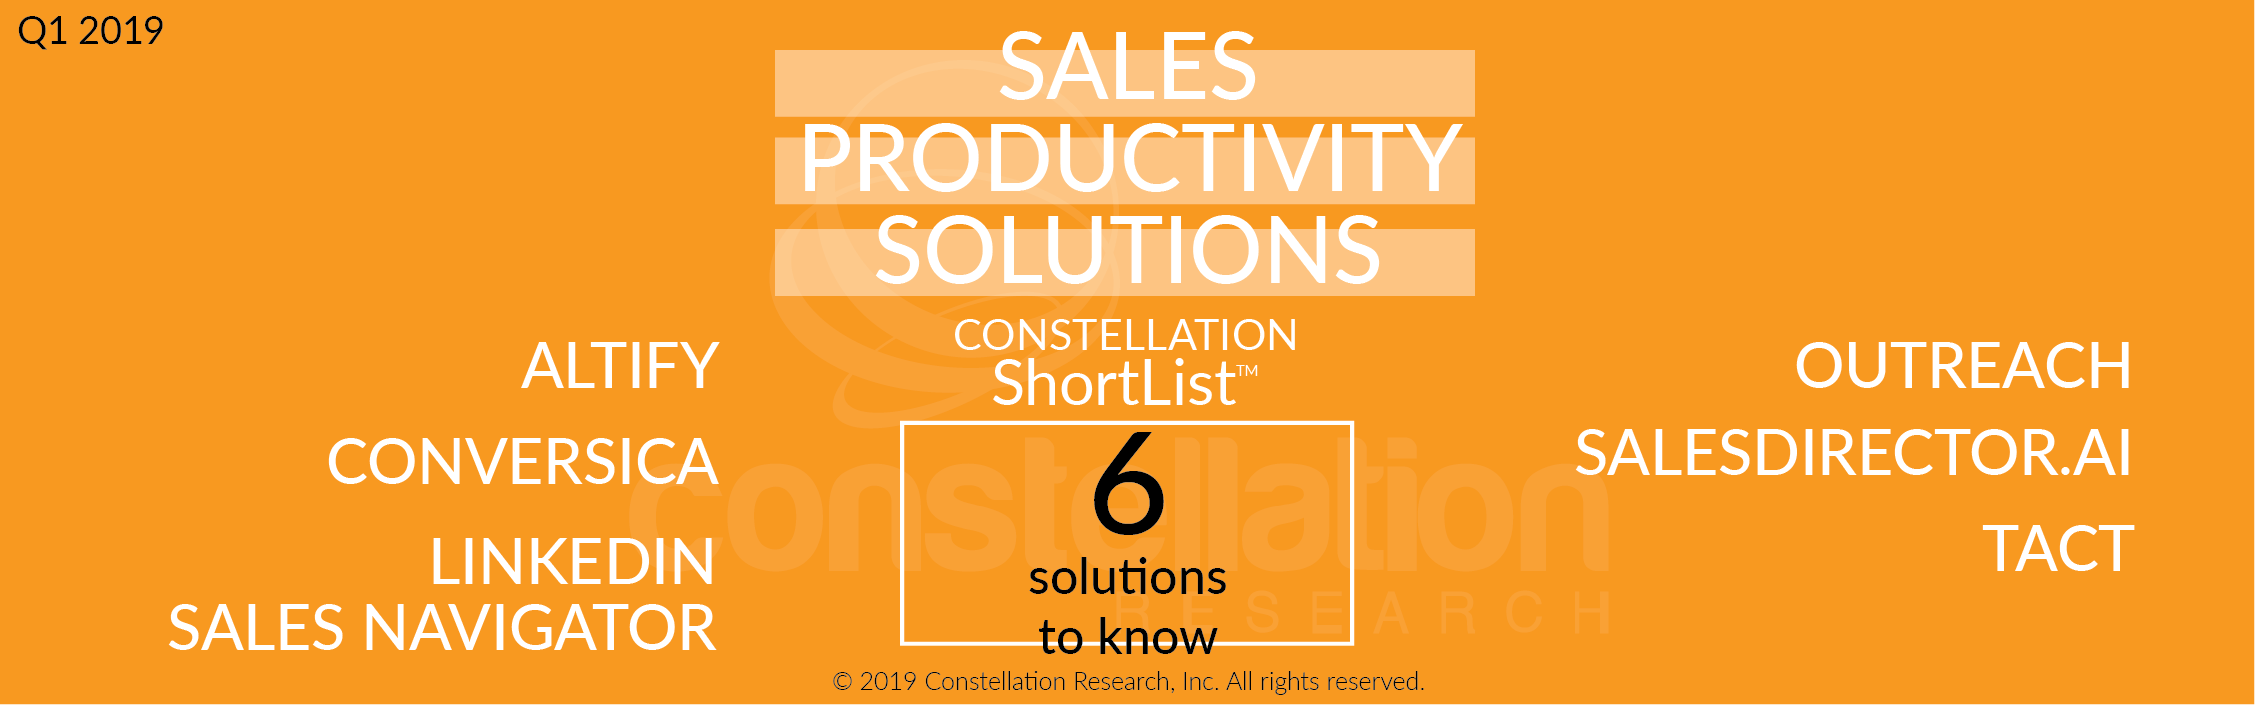 Sales Productivity Tools shortlist-image 2019Q1